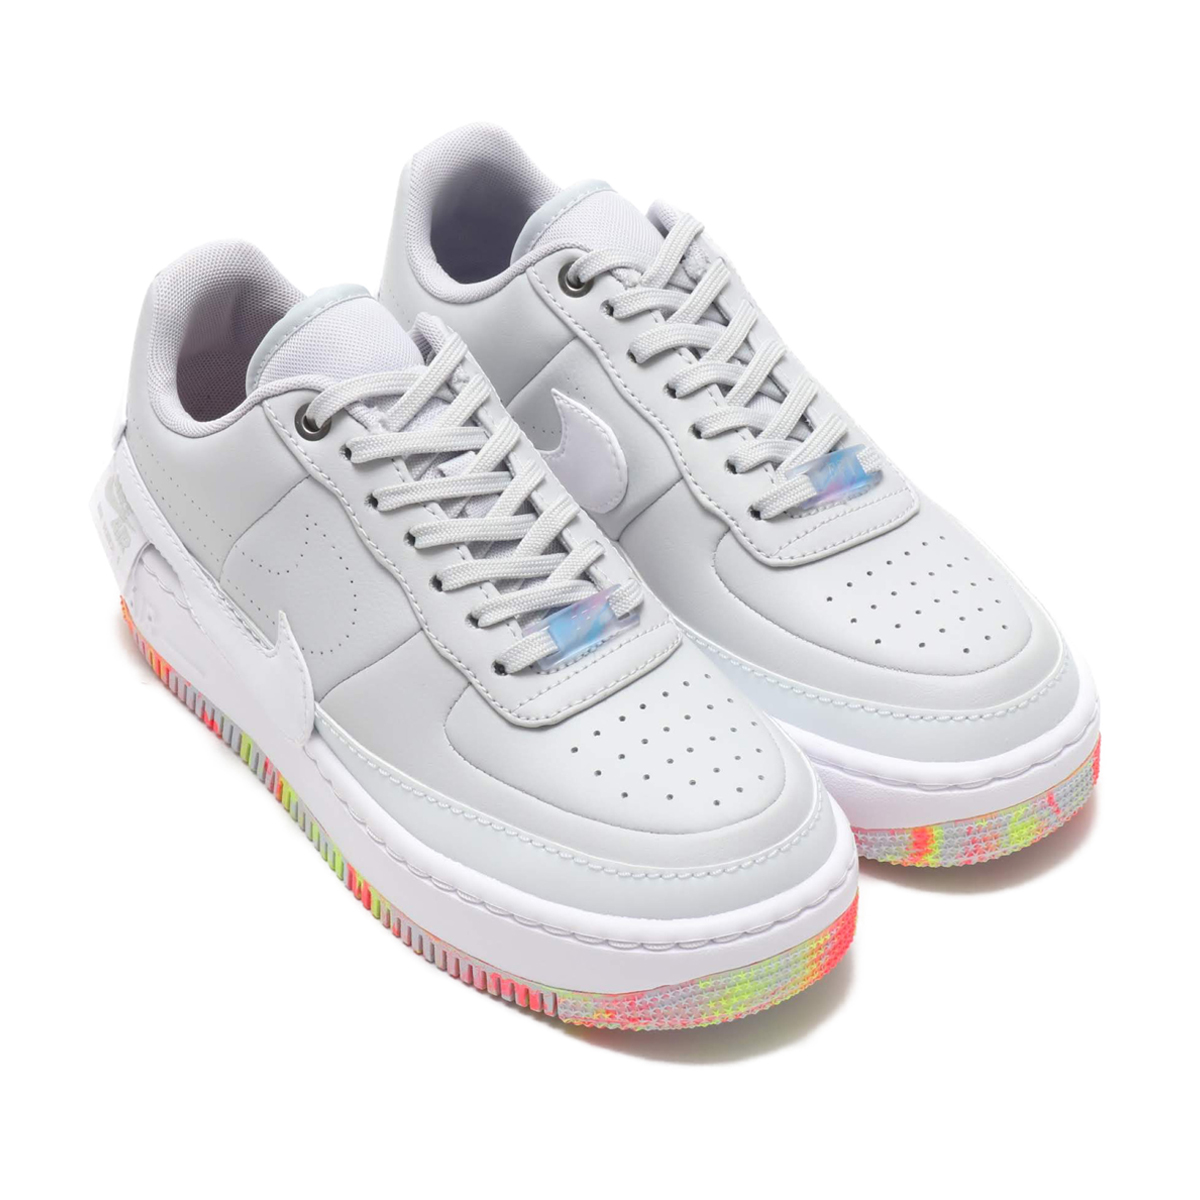 hot sales f8eb3 f3edf NIKE W AF1 JESTER XX PRINT (Nike women AF1 JESTER XX print) PURE PLATINUM  ...